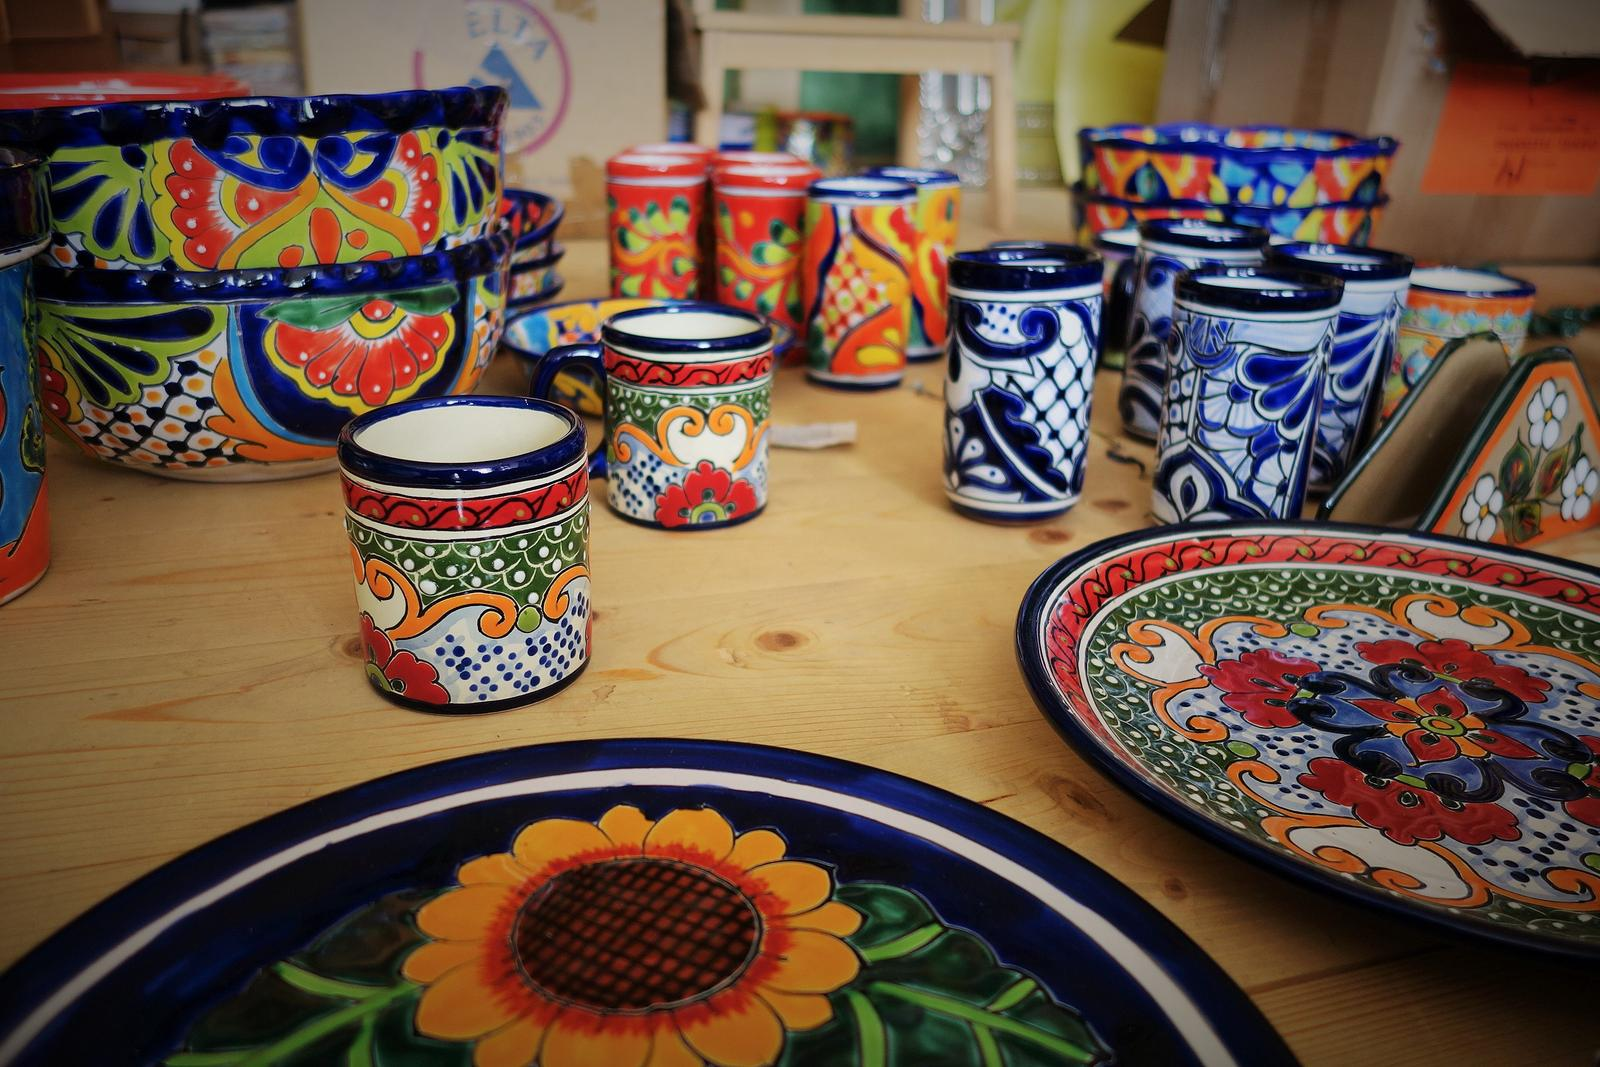 lagartija - Ponúkame aj pestro maľovanú keramiku.